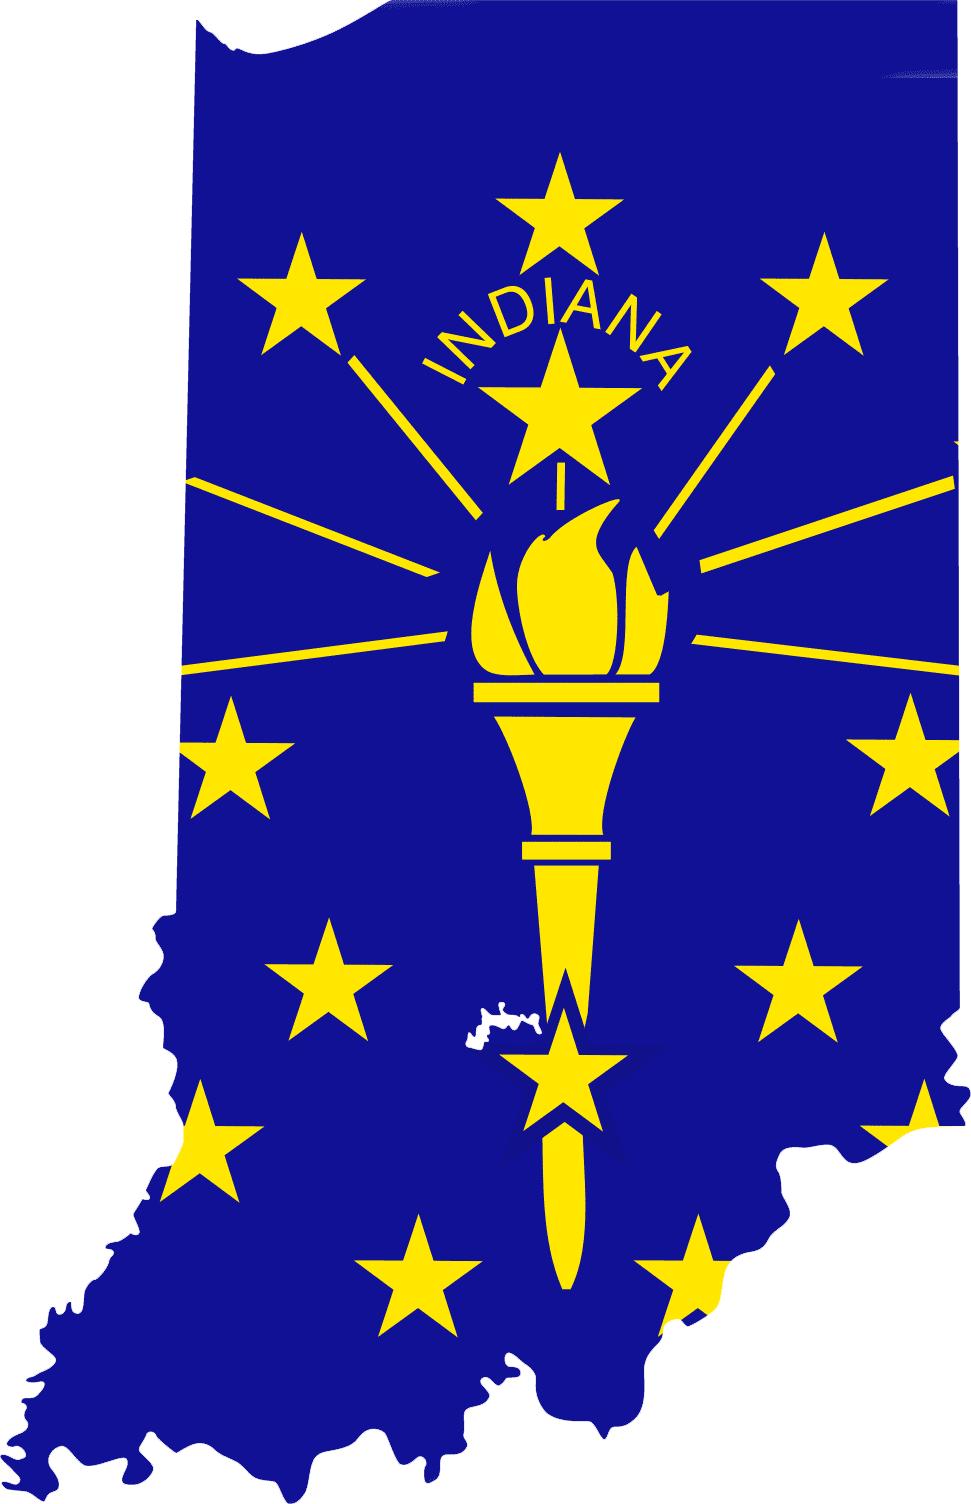 http://en.wikipedia.org/wiki/Indiana